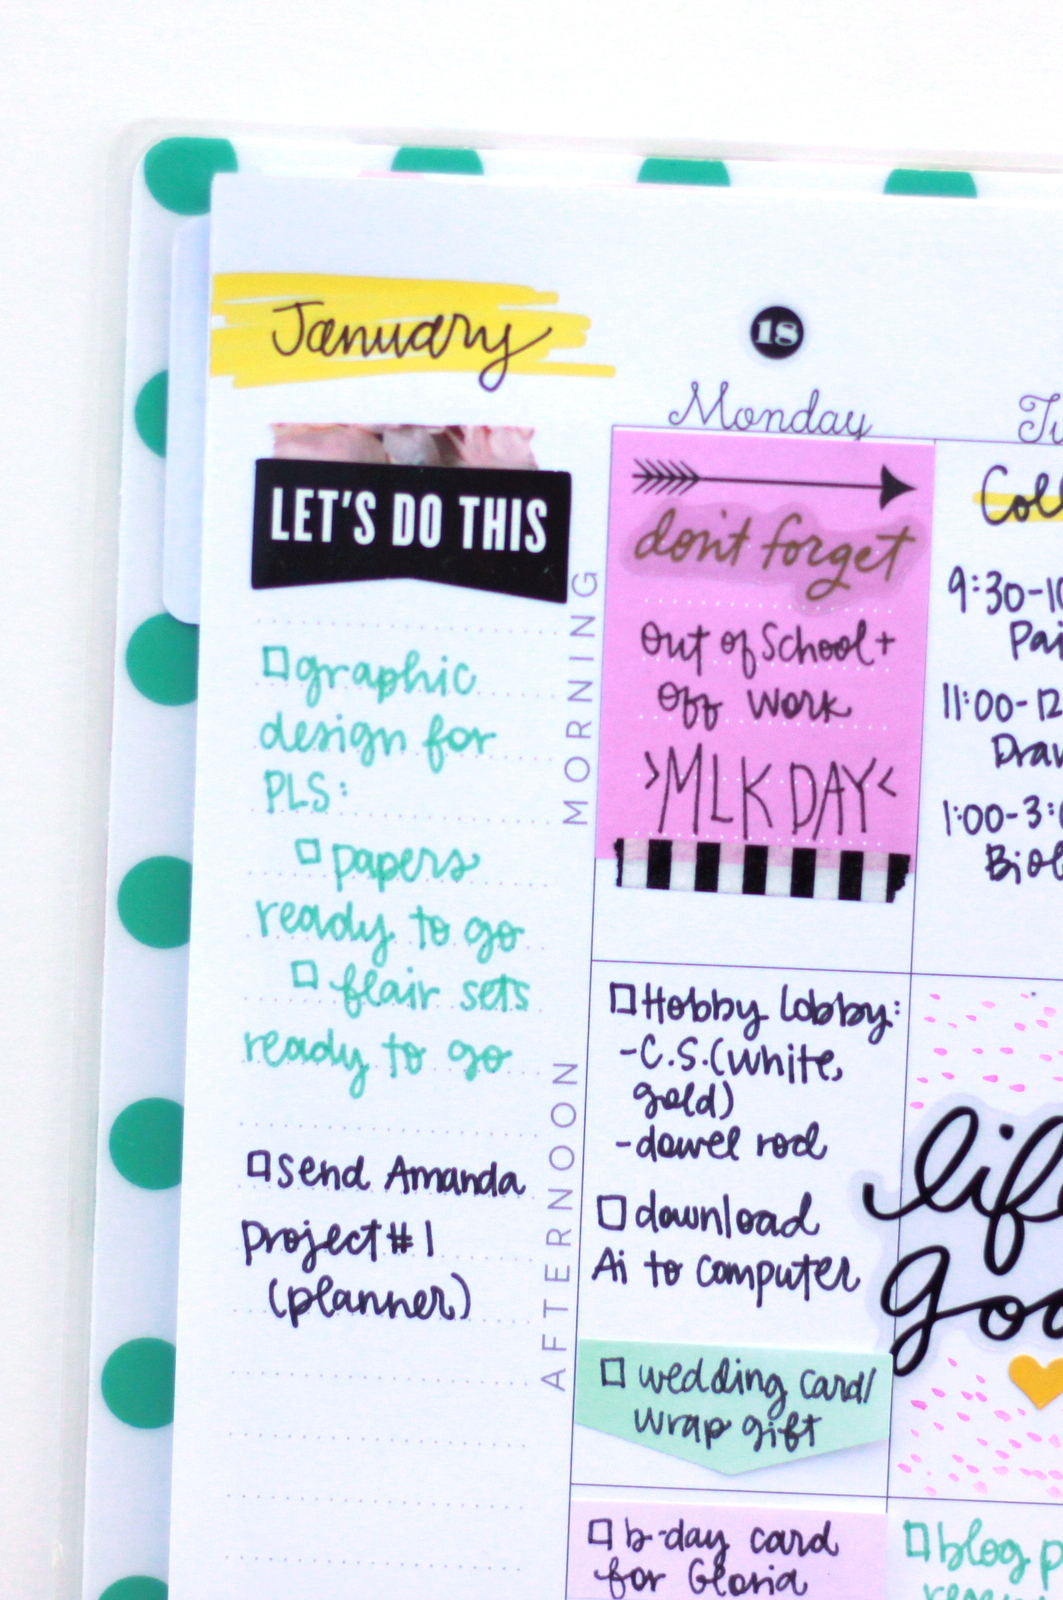 last week in January w/ watercolor doodles in The Happy Planner™ of mambi Design Team member Heather Adams   me & my BIG ideas